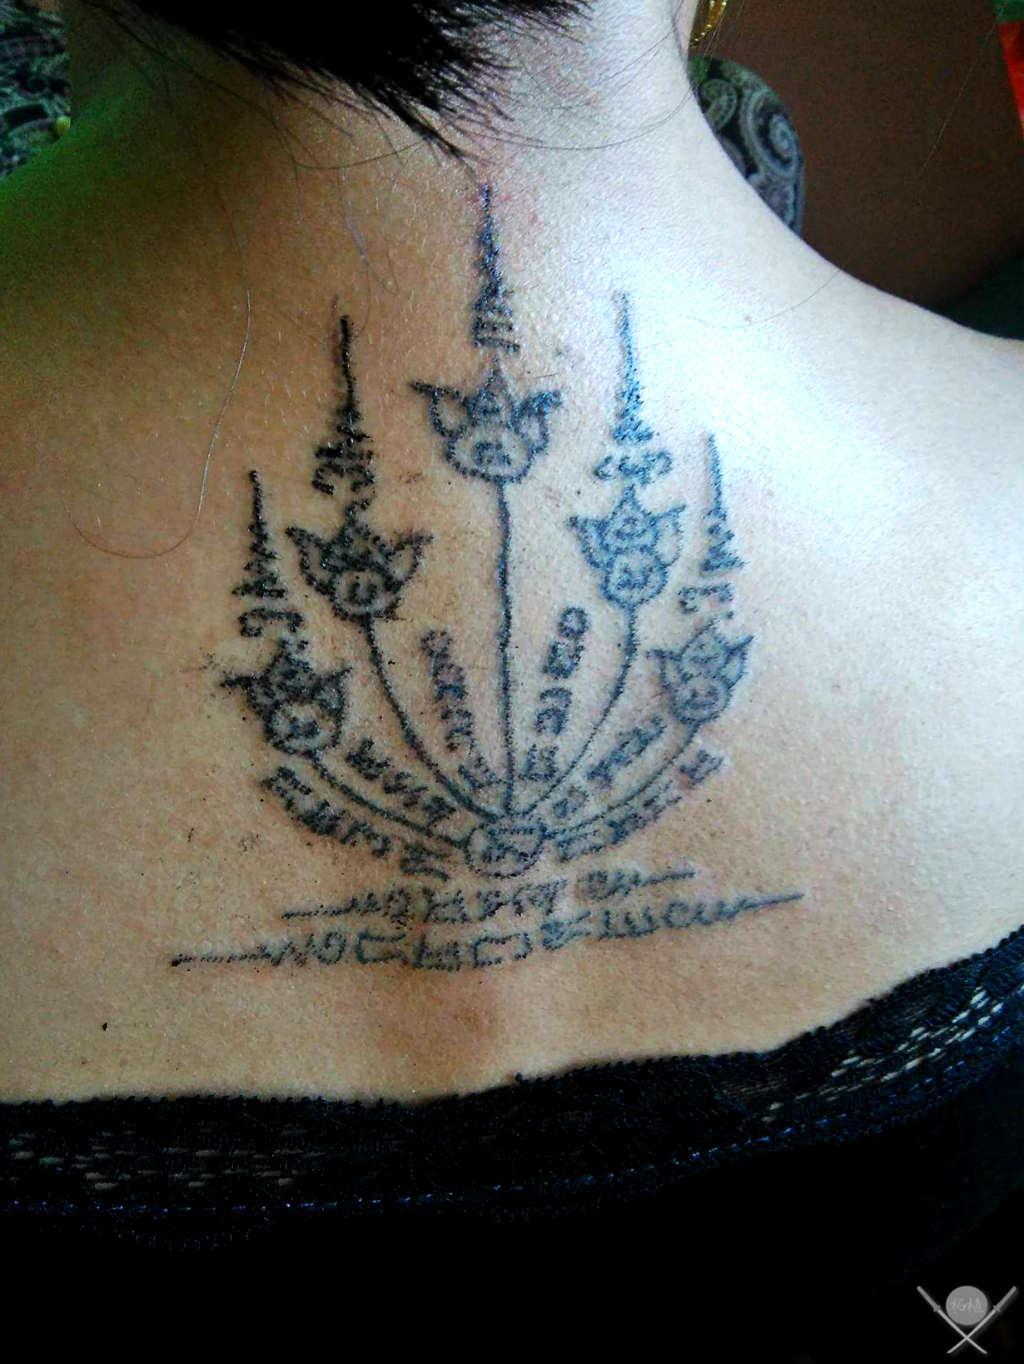 Thailand - Chiang Mai - Tattoo Marina 2 - Viagens - Vida de Tsuge - VDT